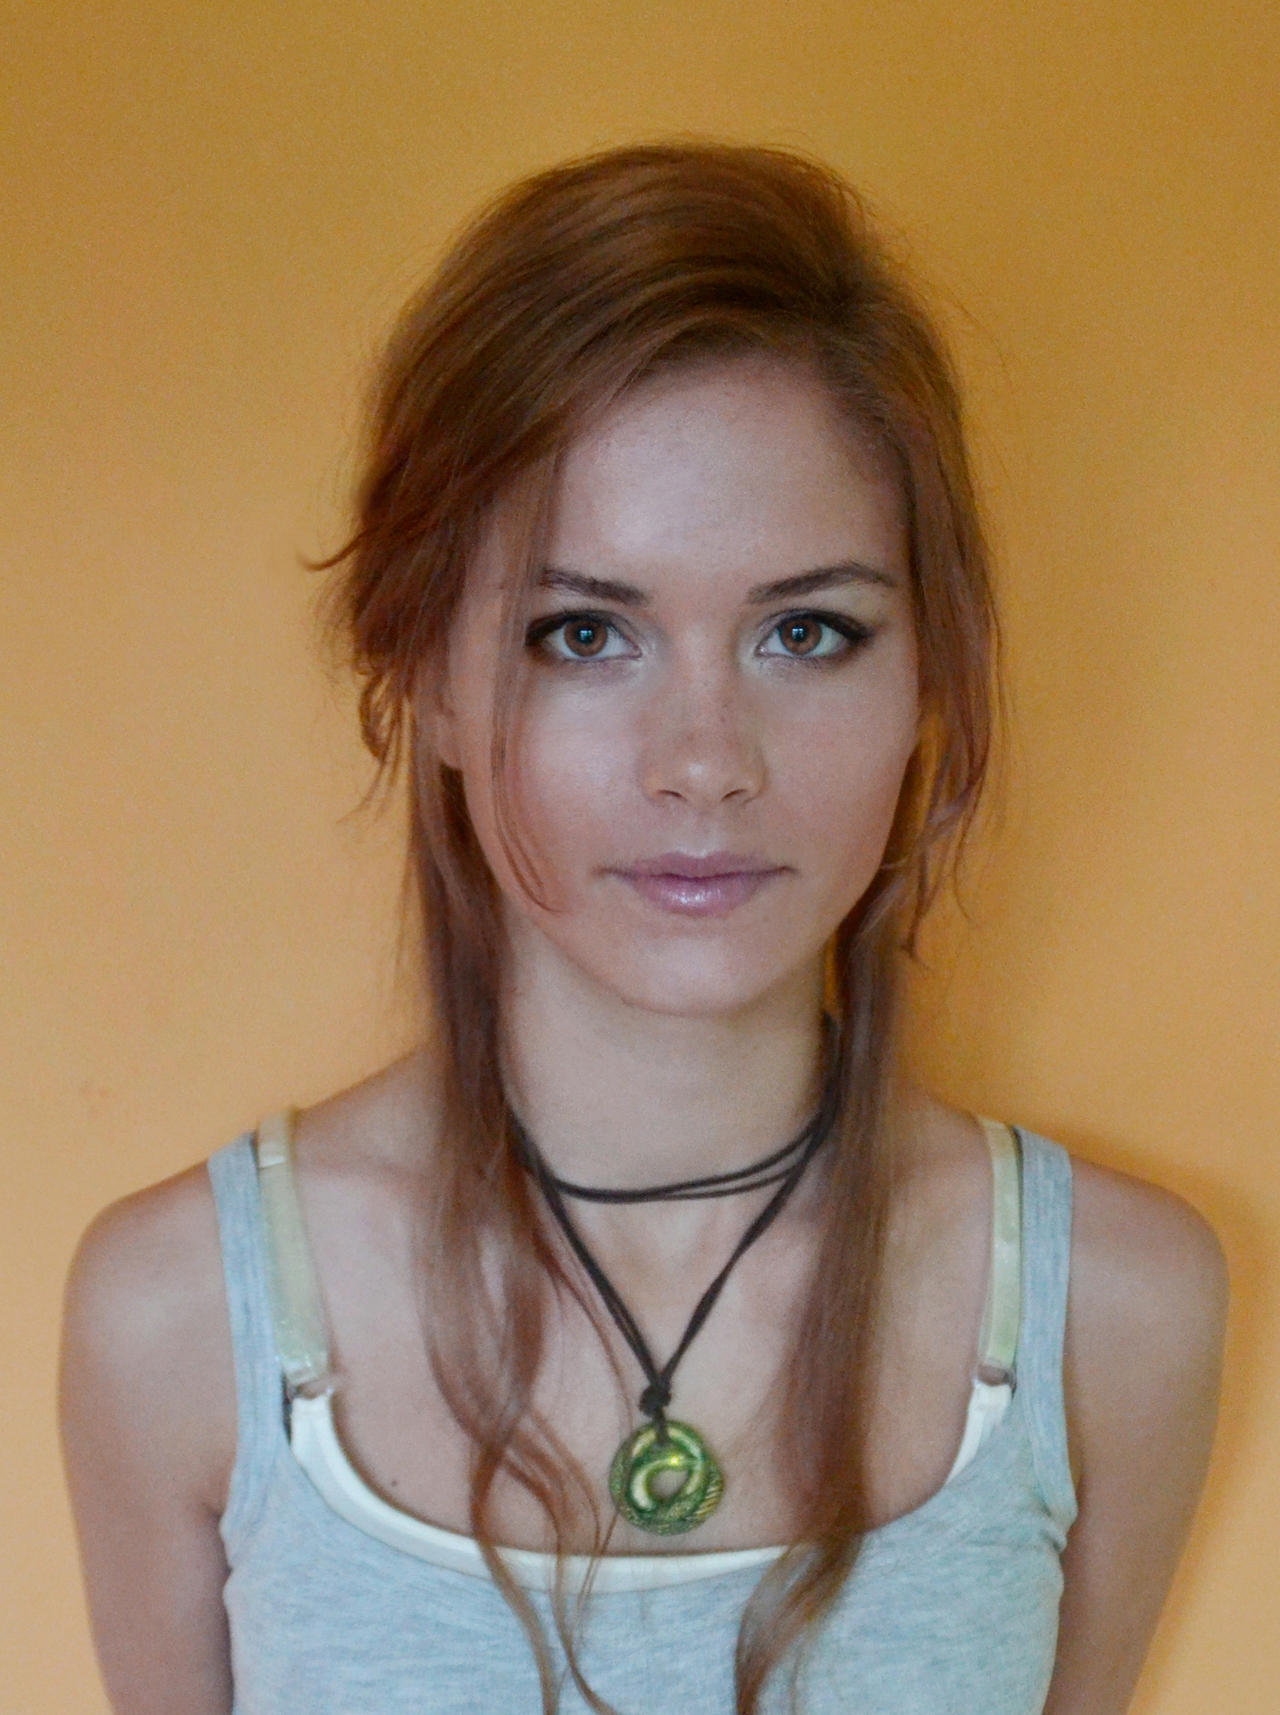 Lara Croft cosplay 2013 TEST by konradM96